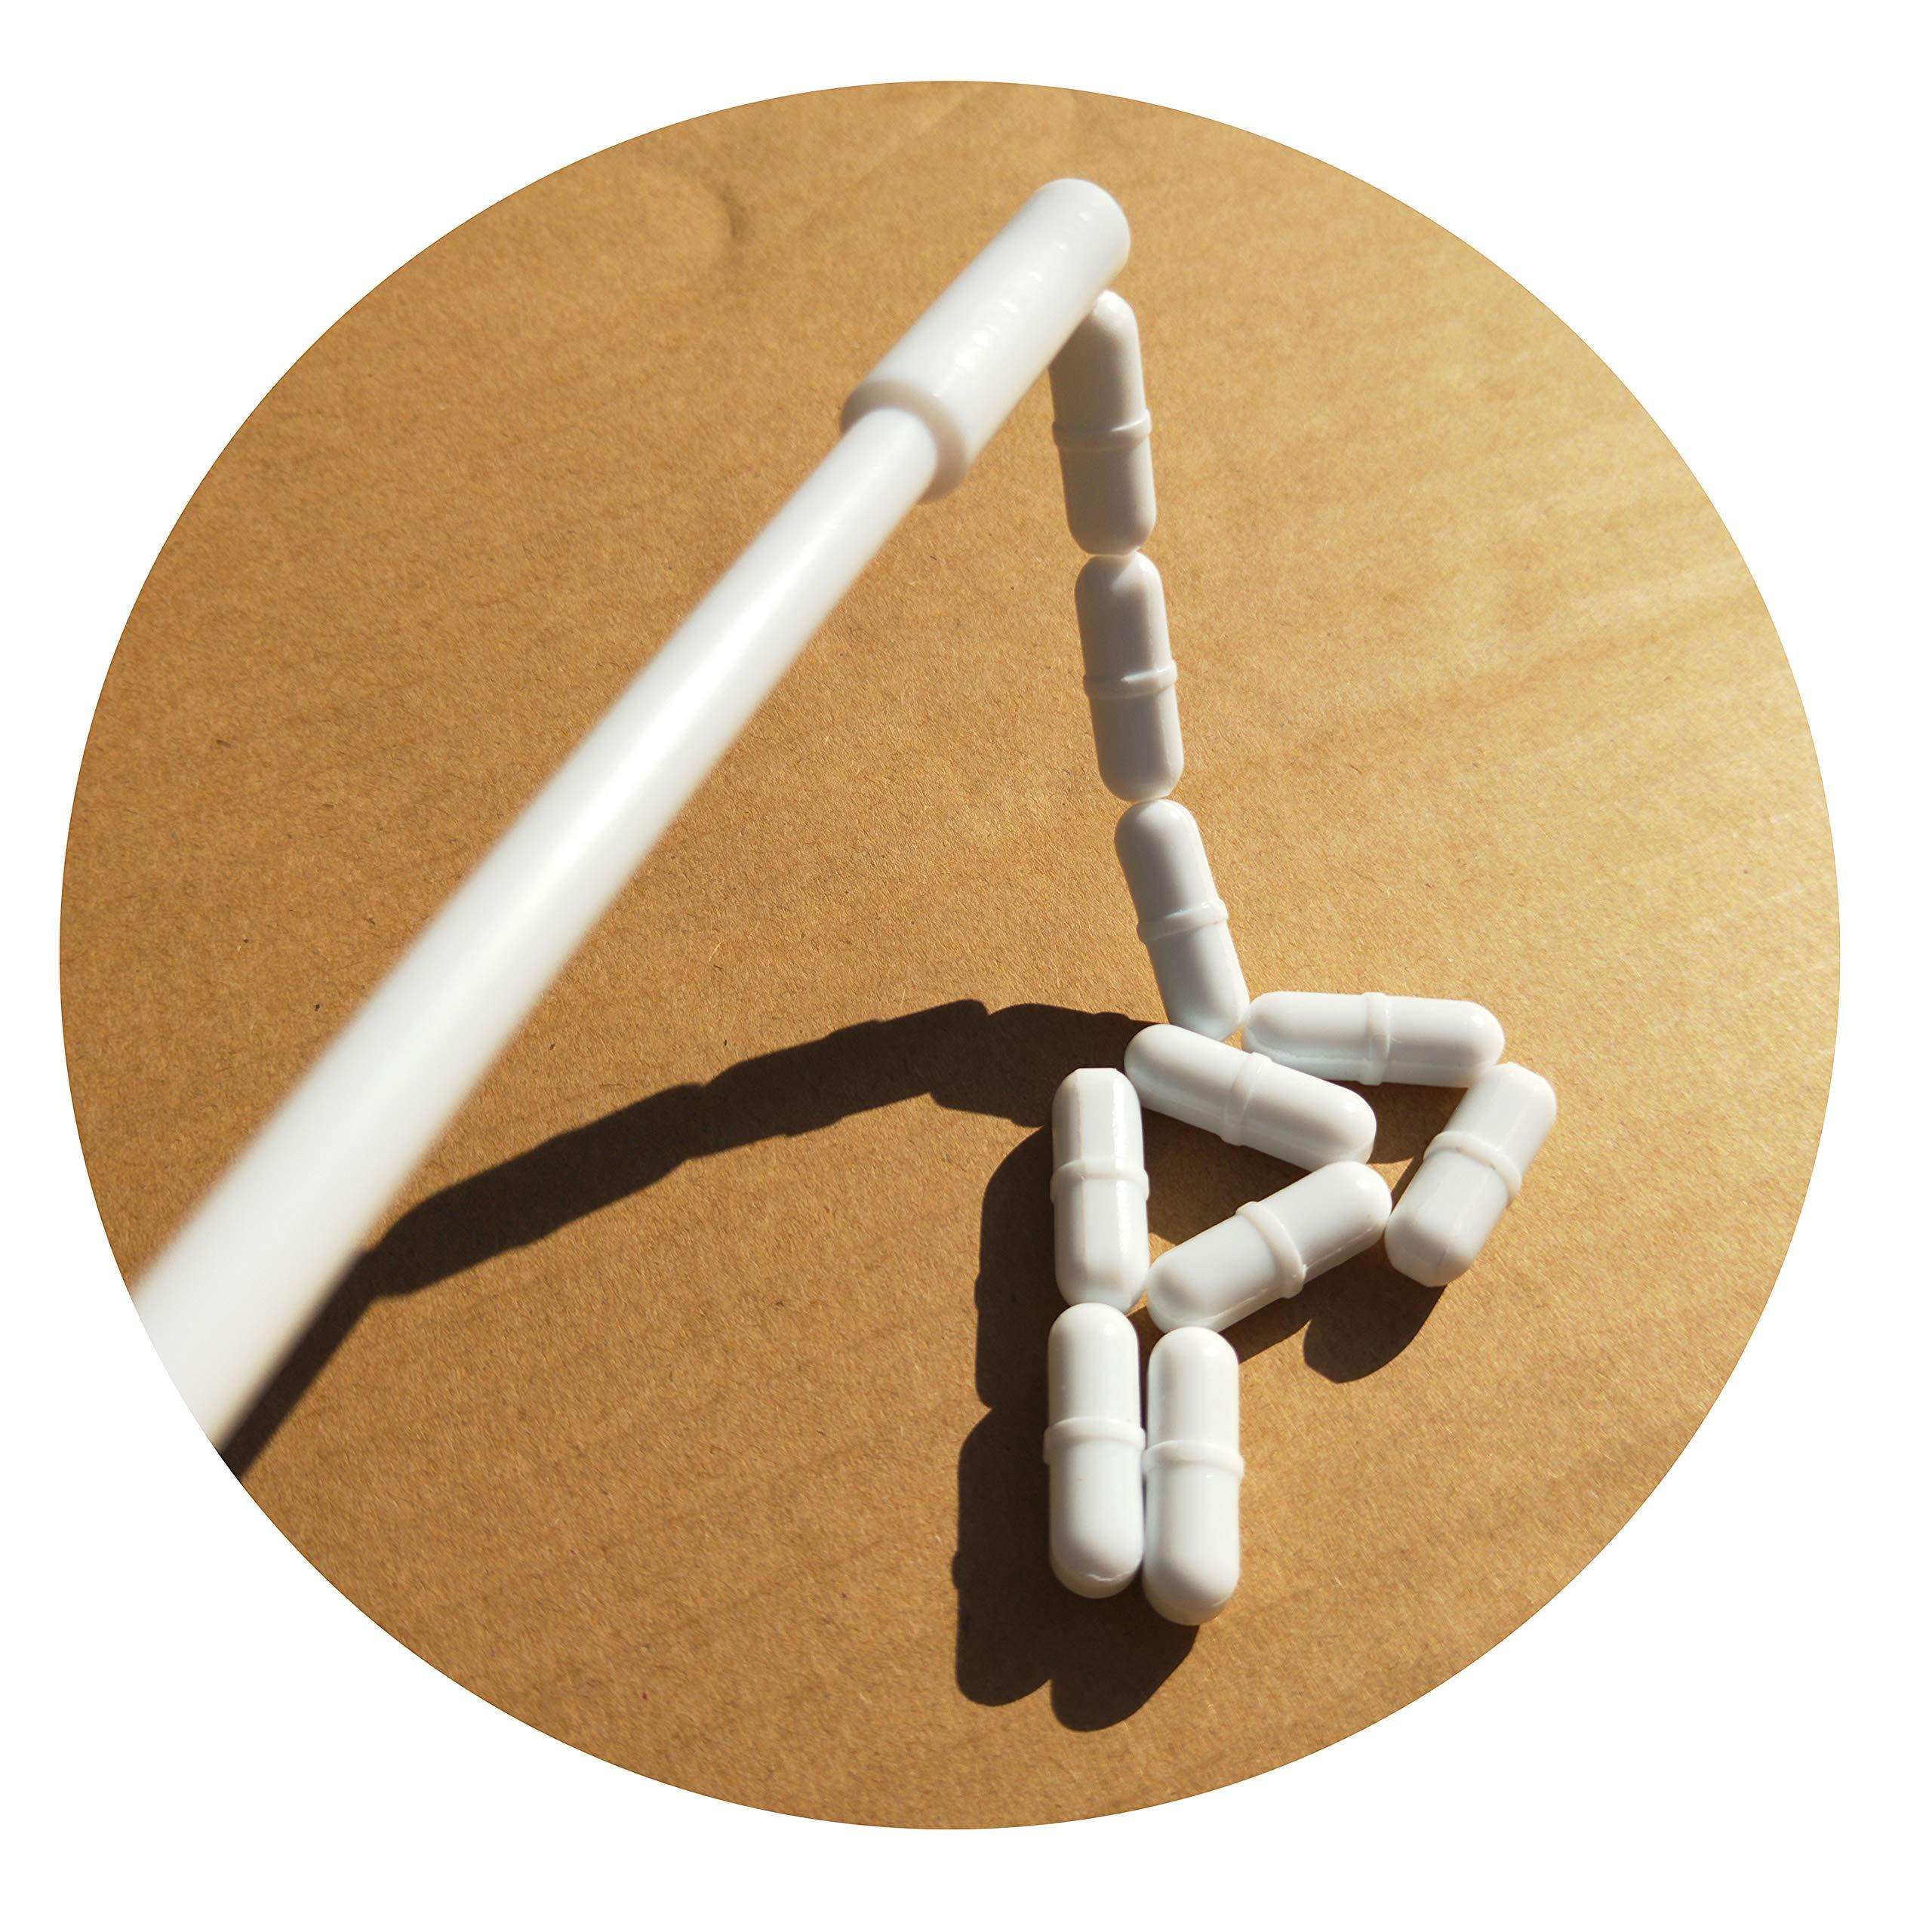 Inch Magnetic Stirrer Stir Retriever